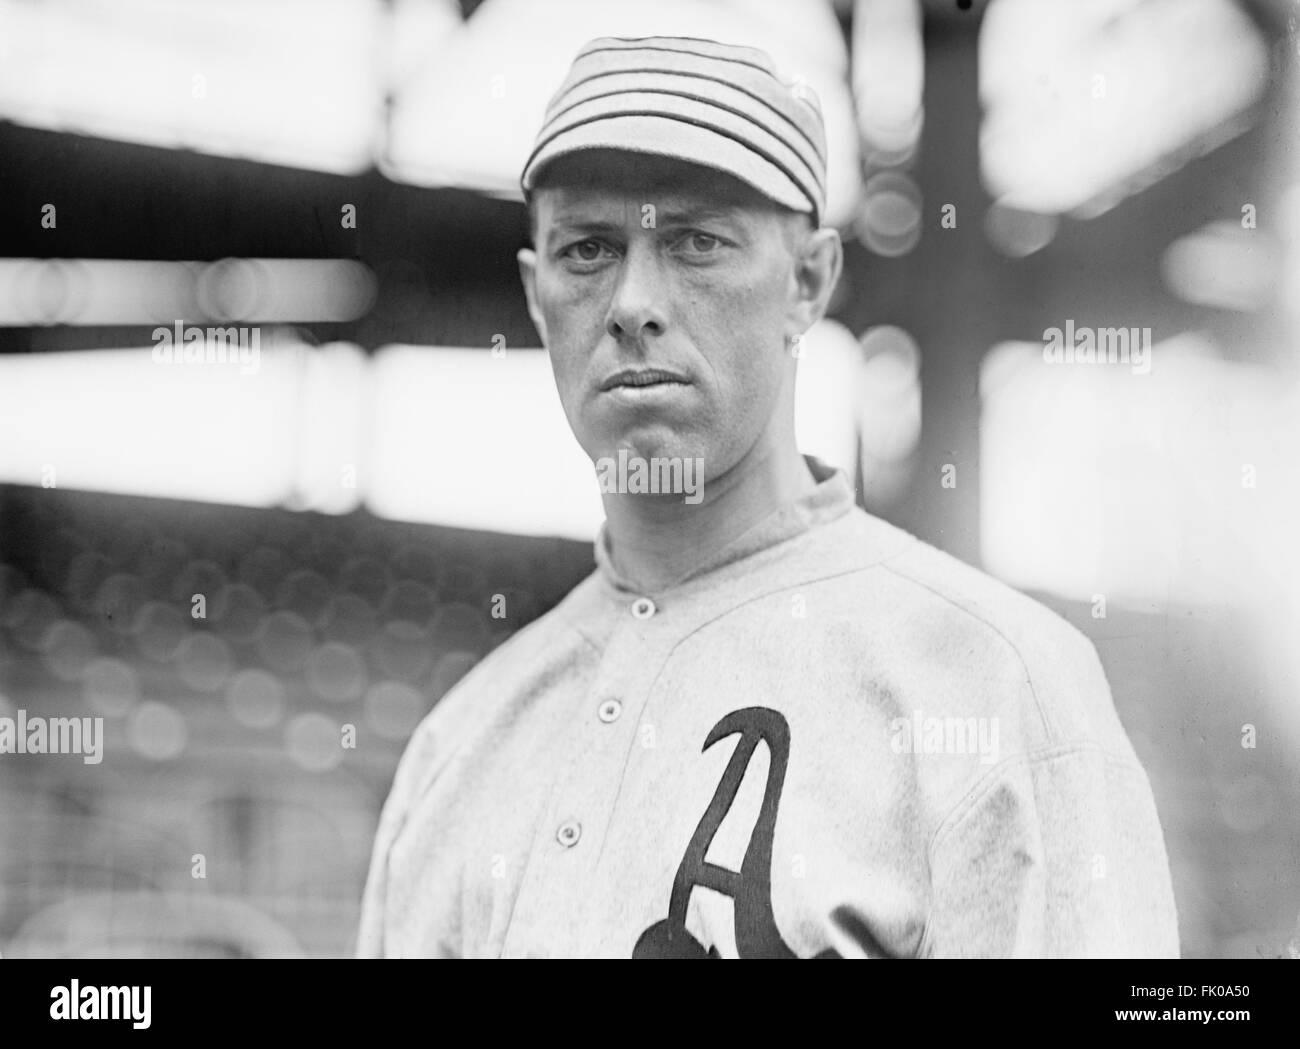 Jack Coombs, Major League Baseball Player, Philadelphia Athletics, Portrait, circa 1914.jpg - Stock Image